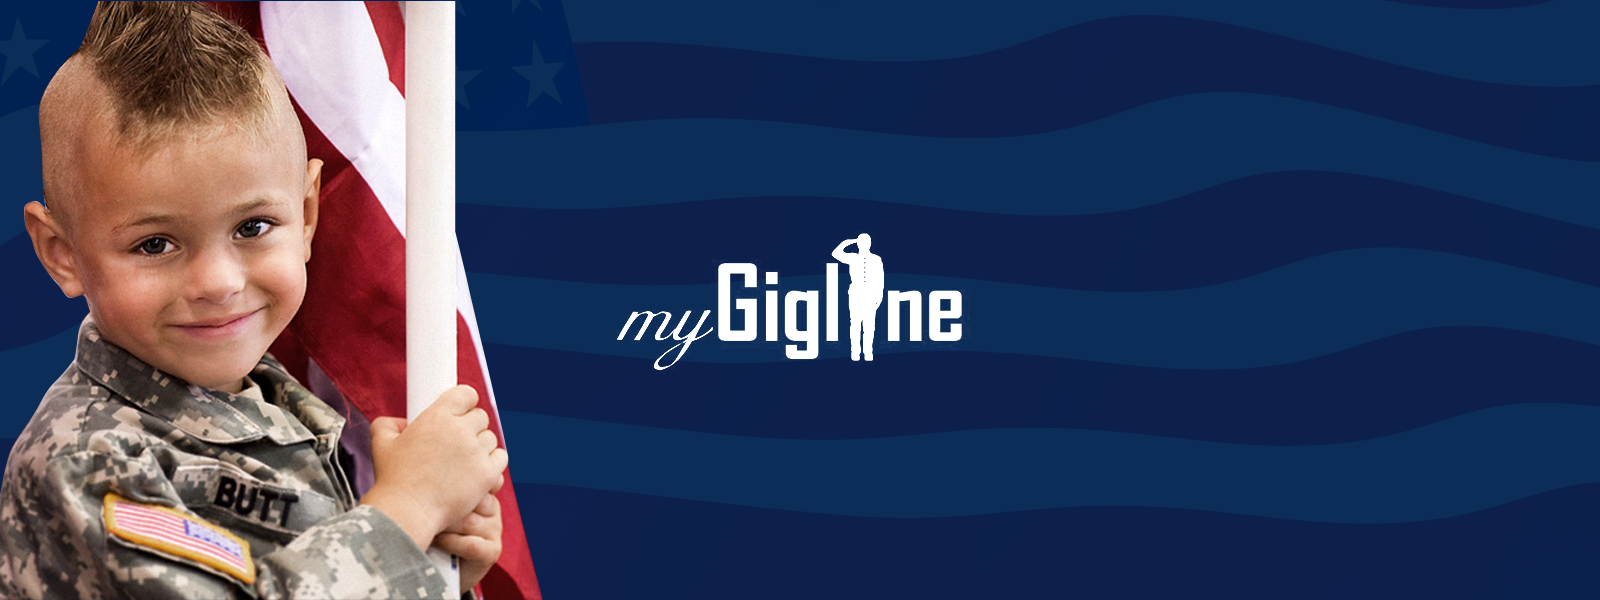 MyGigline image